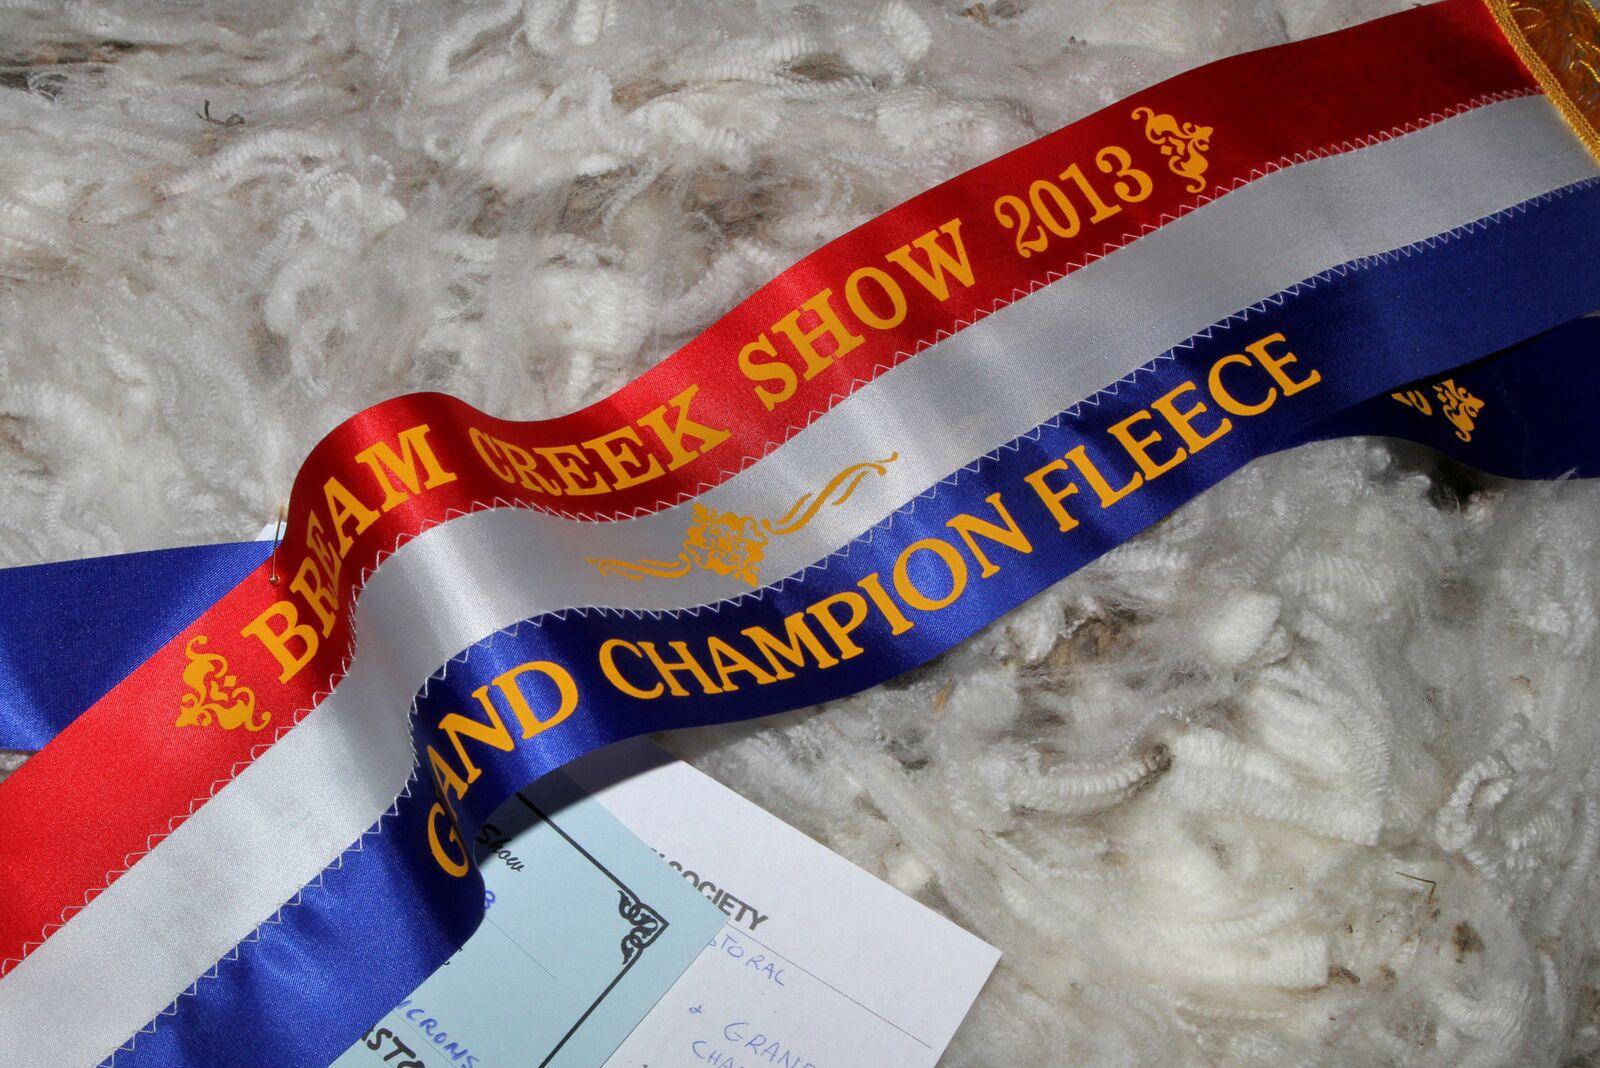 The winning fleece.